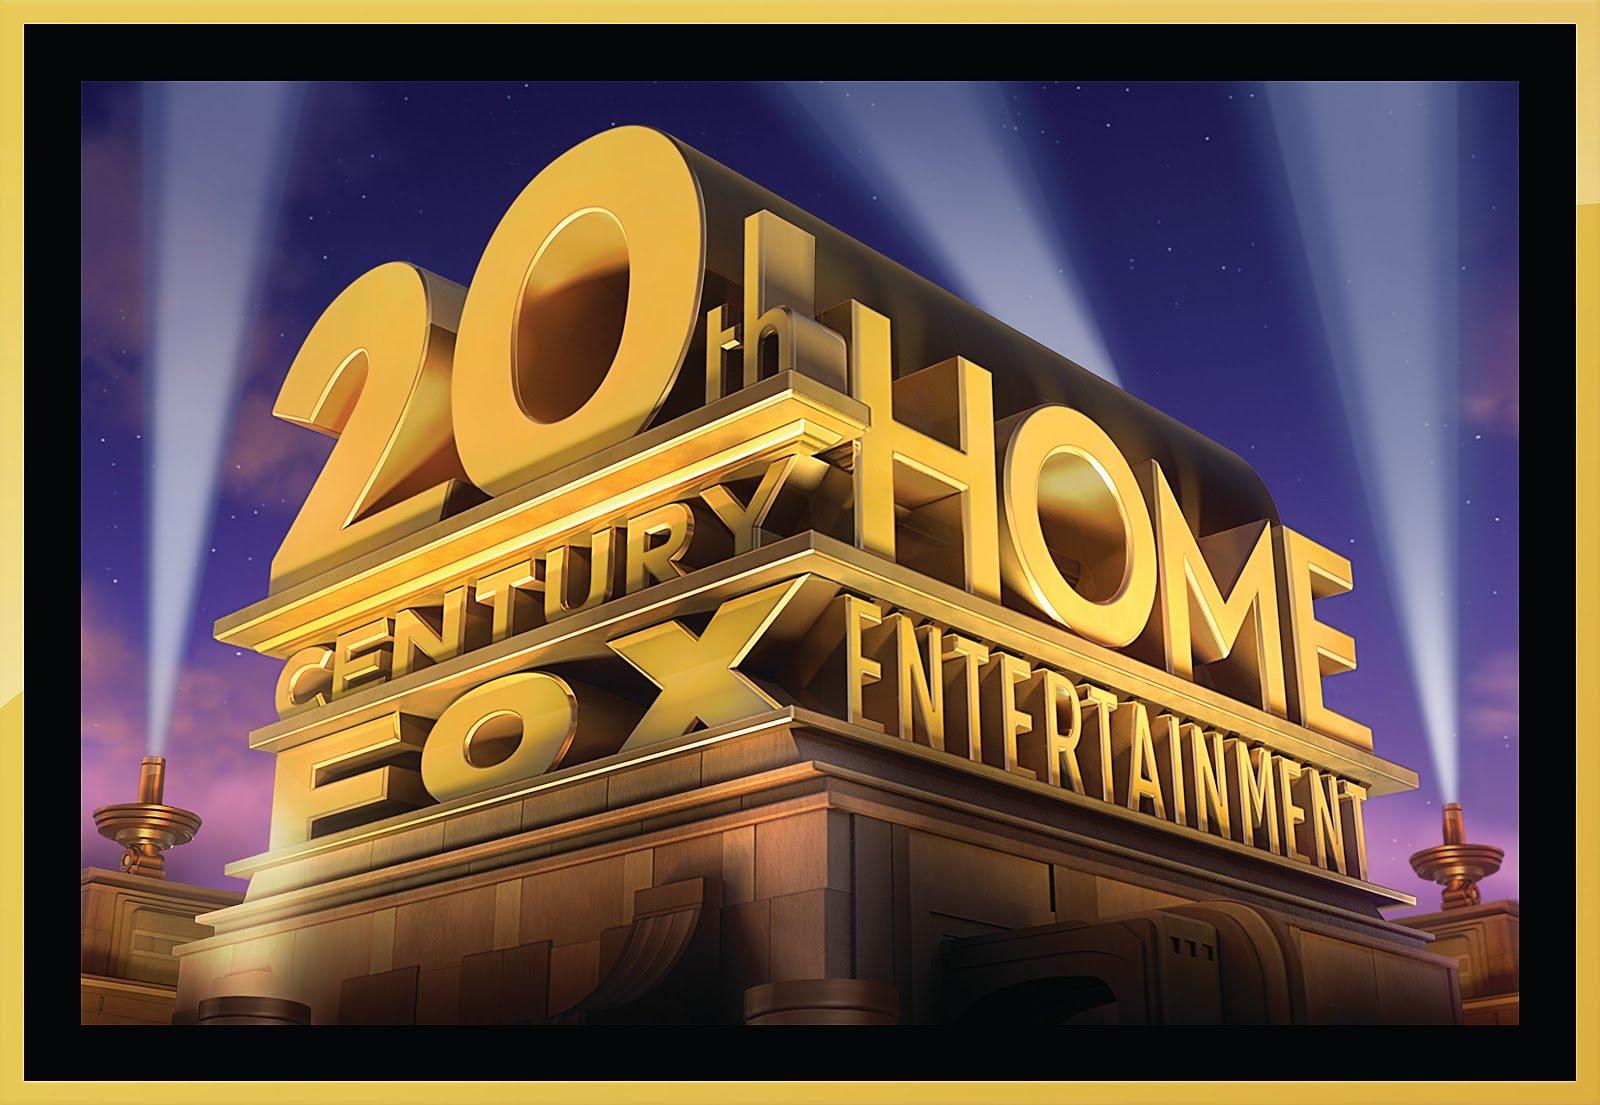 Image 20th Century Fox Home Entertainment Logo Download 1600x1105